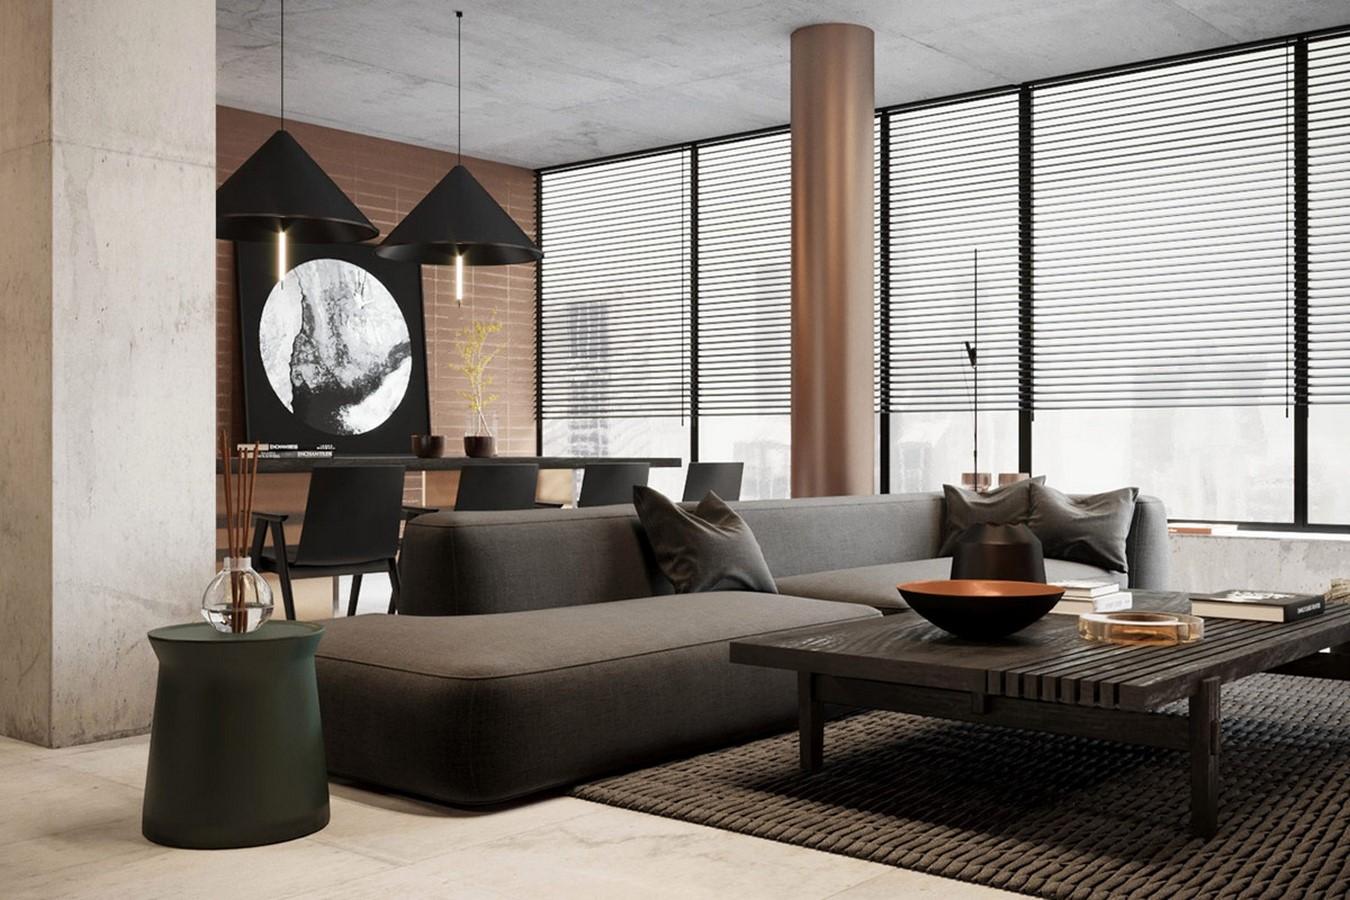 10 Building Materials for Interiors- 2021 Sheet30